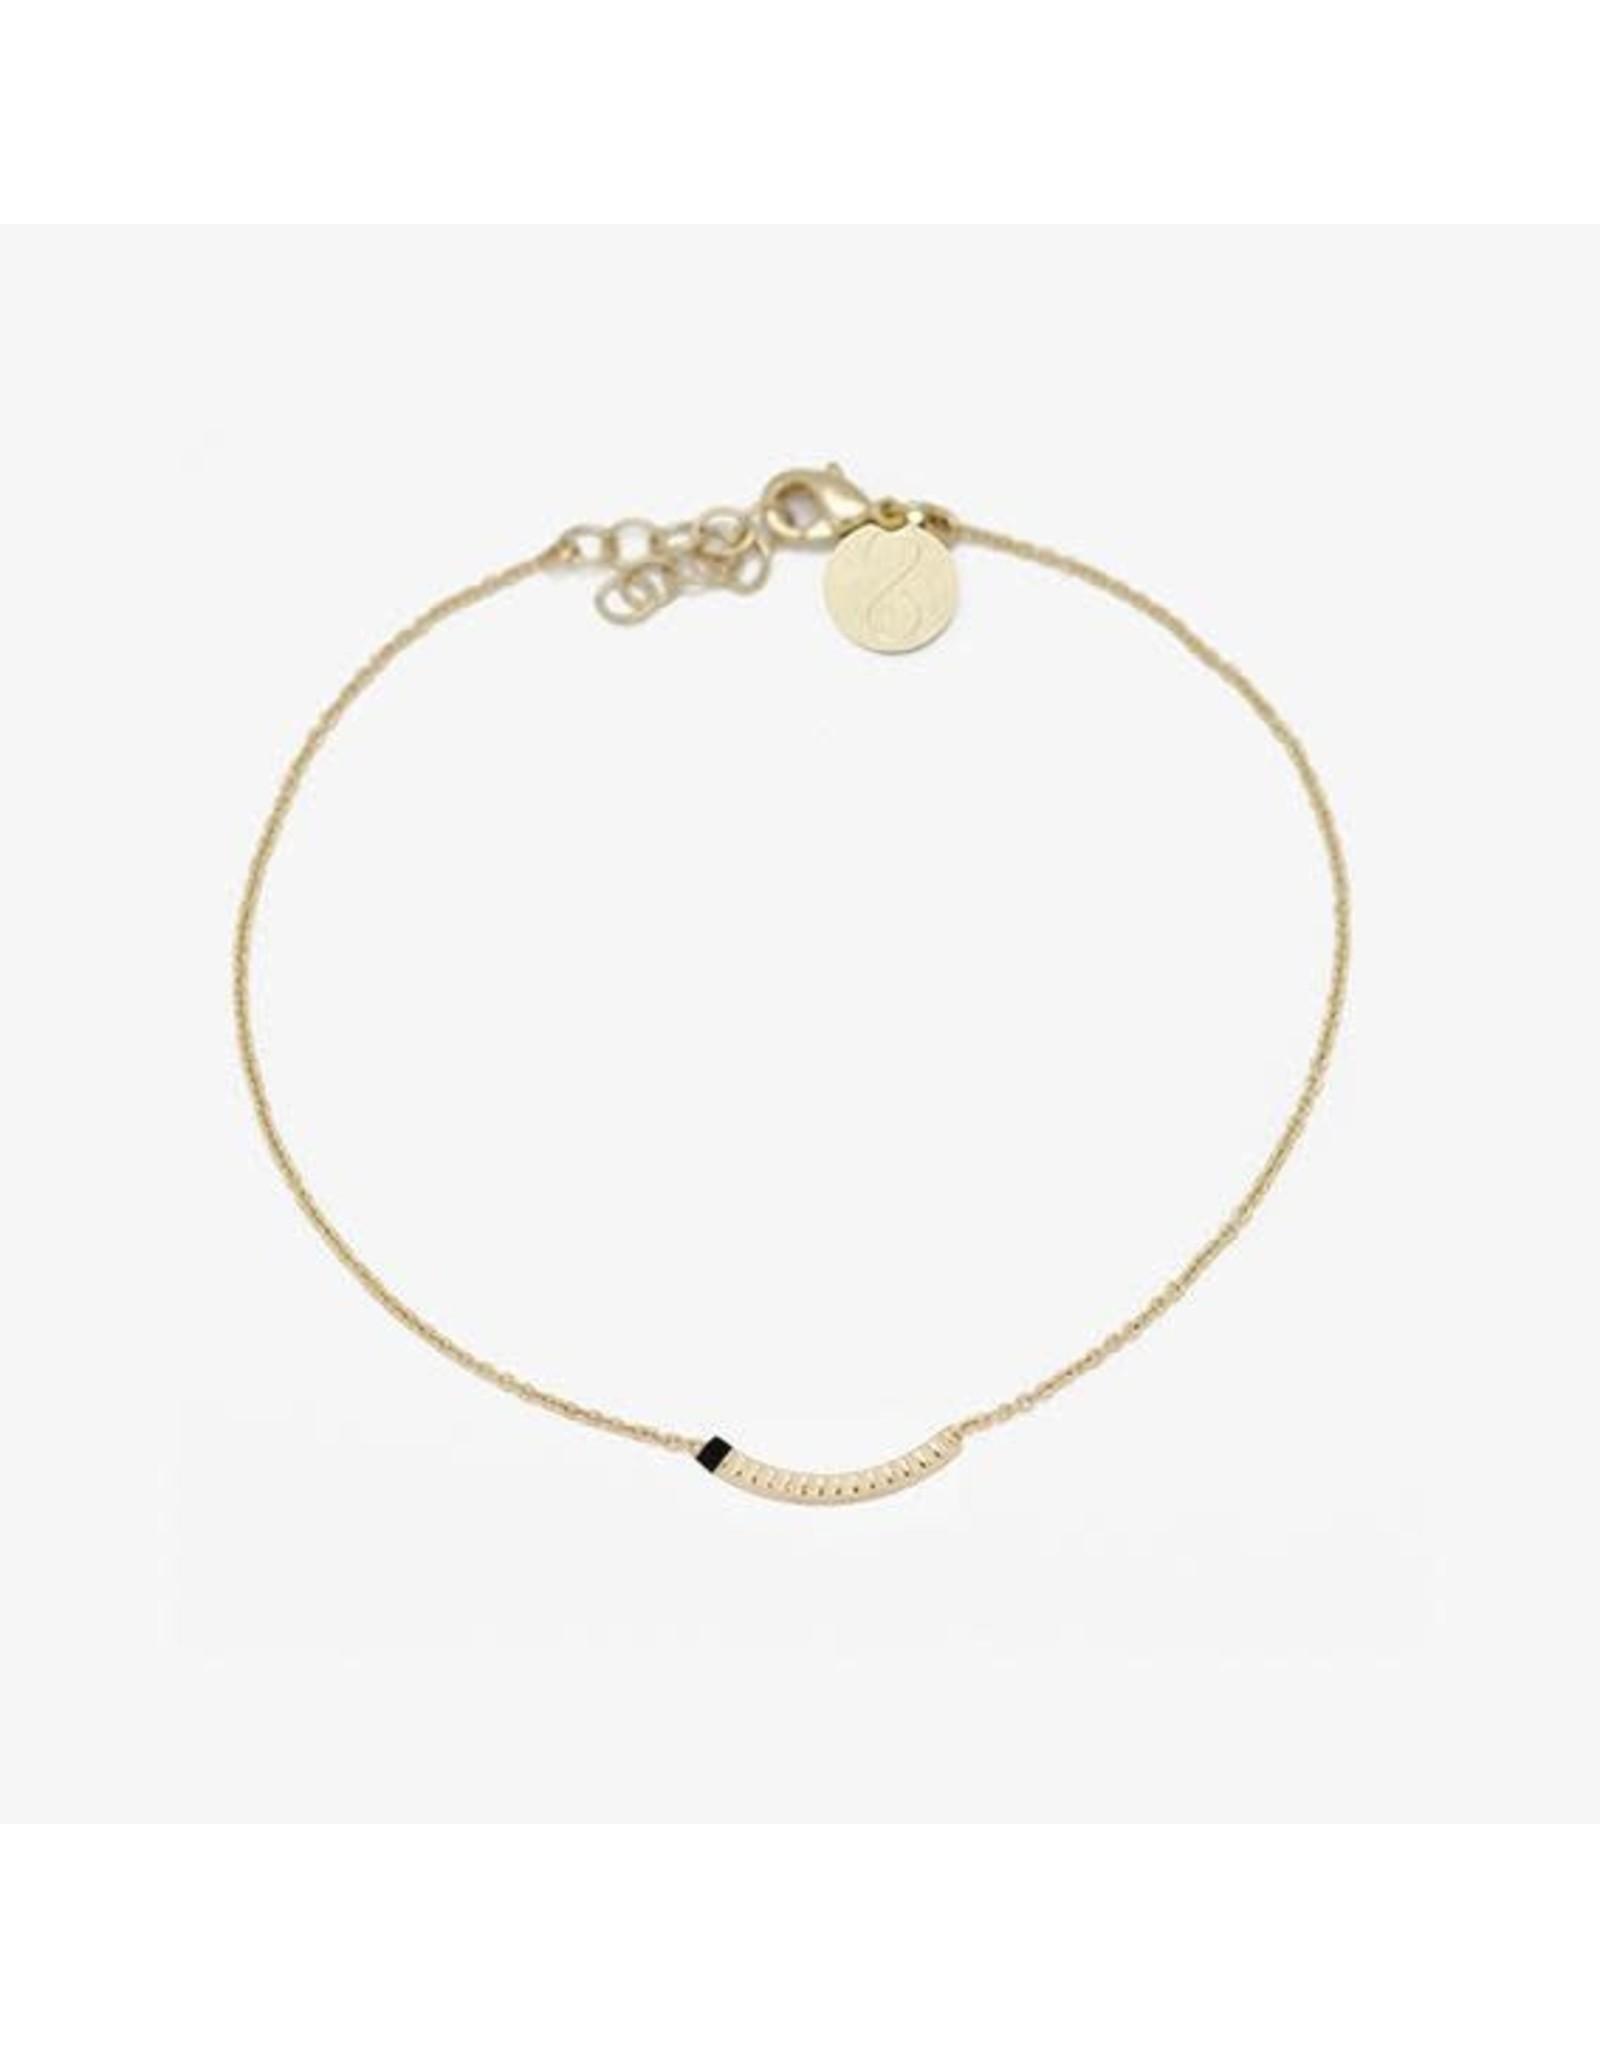 Judith Benita Armband Tadao Simple - Zwart - Messing Verguld - Lengte 15,5cm